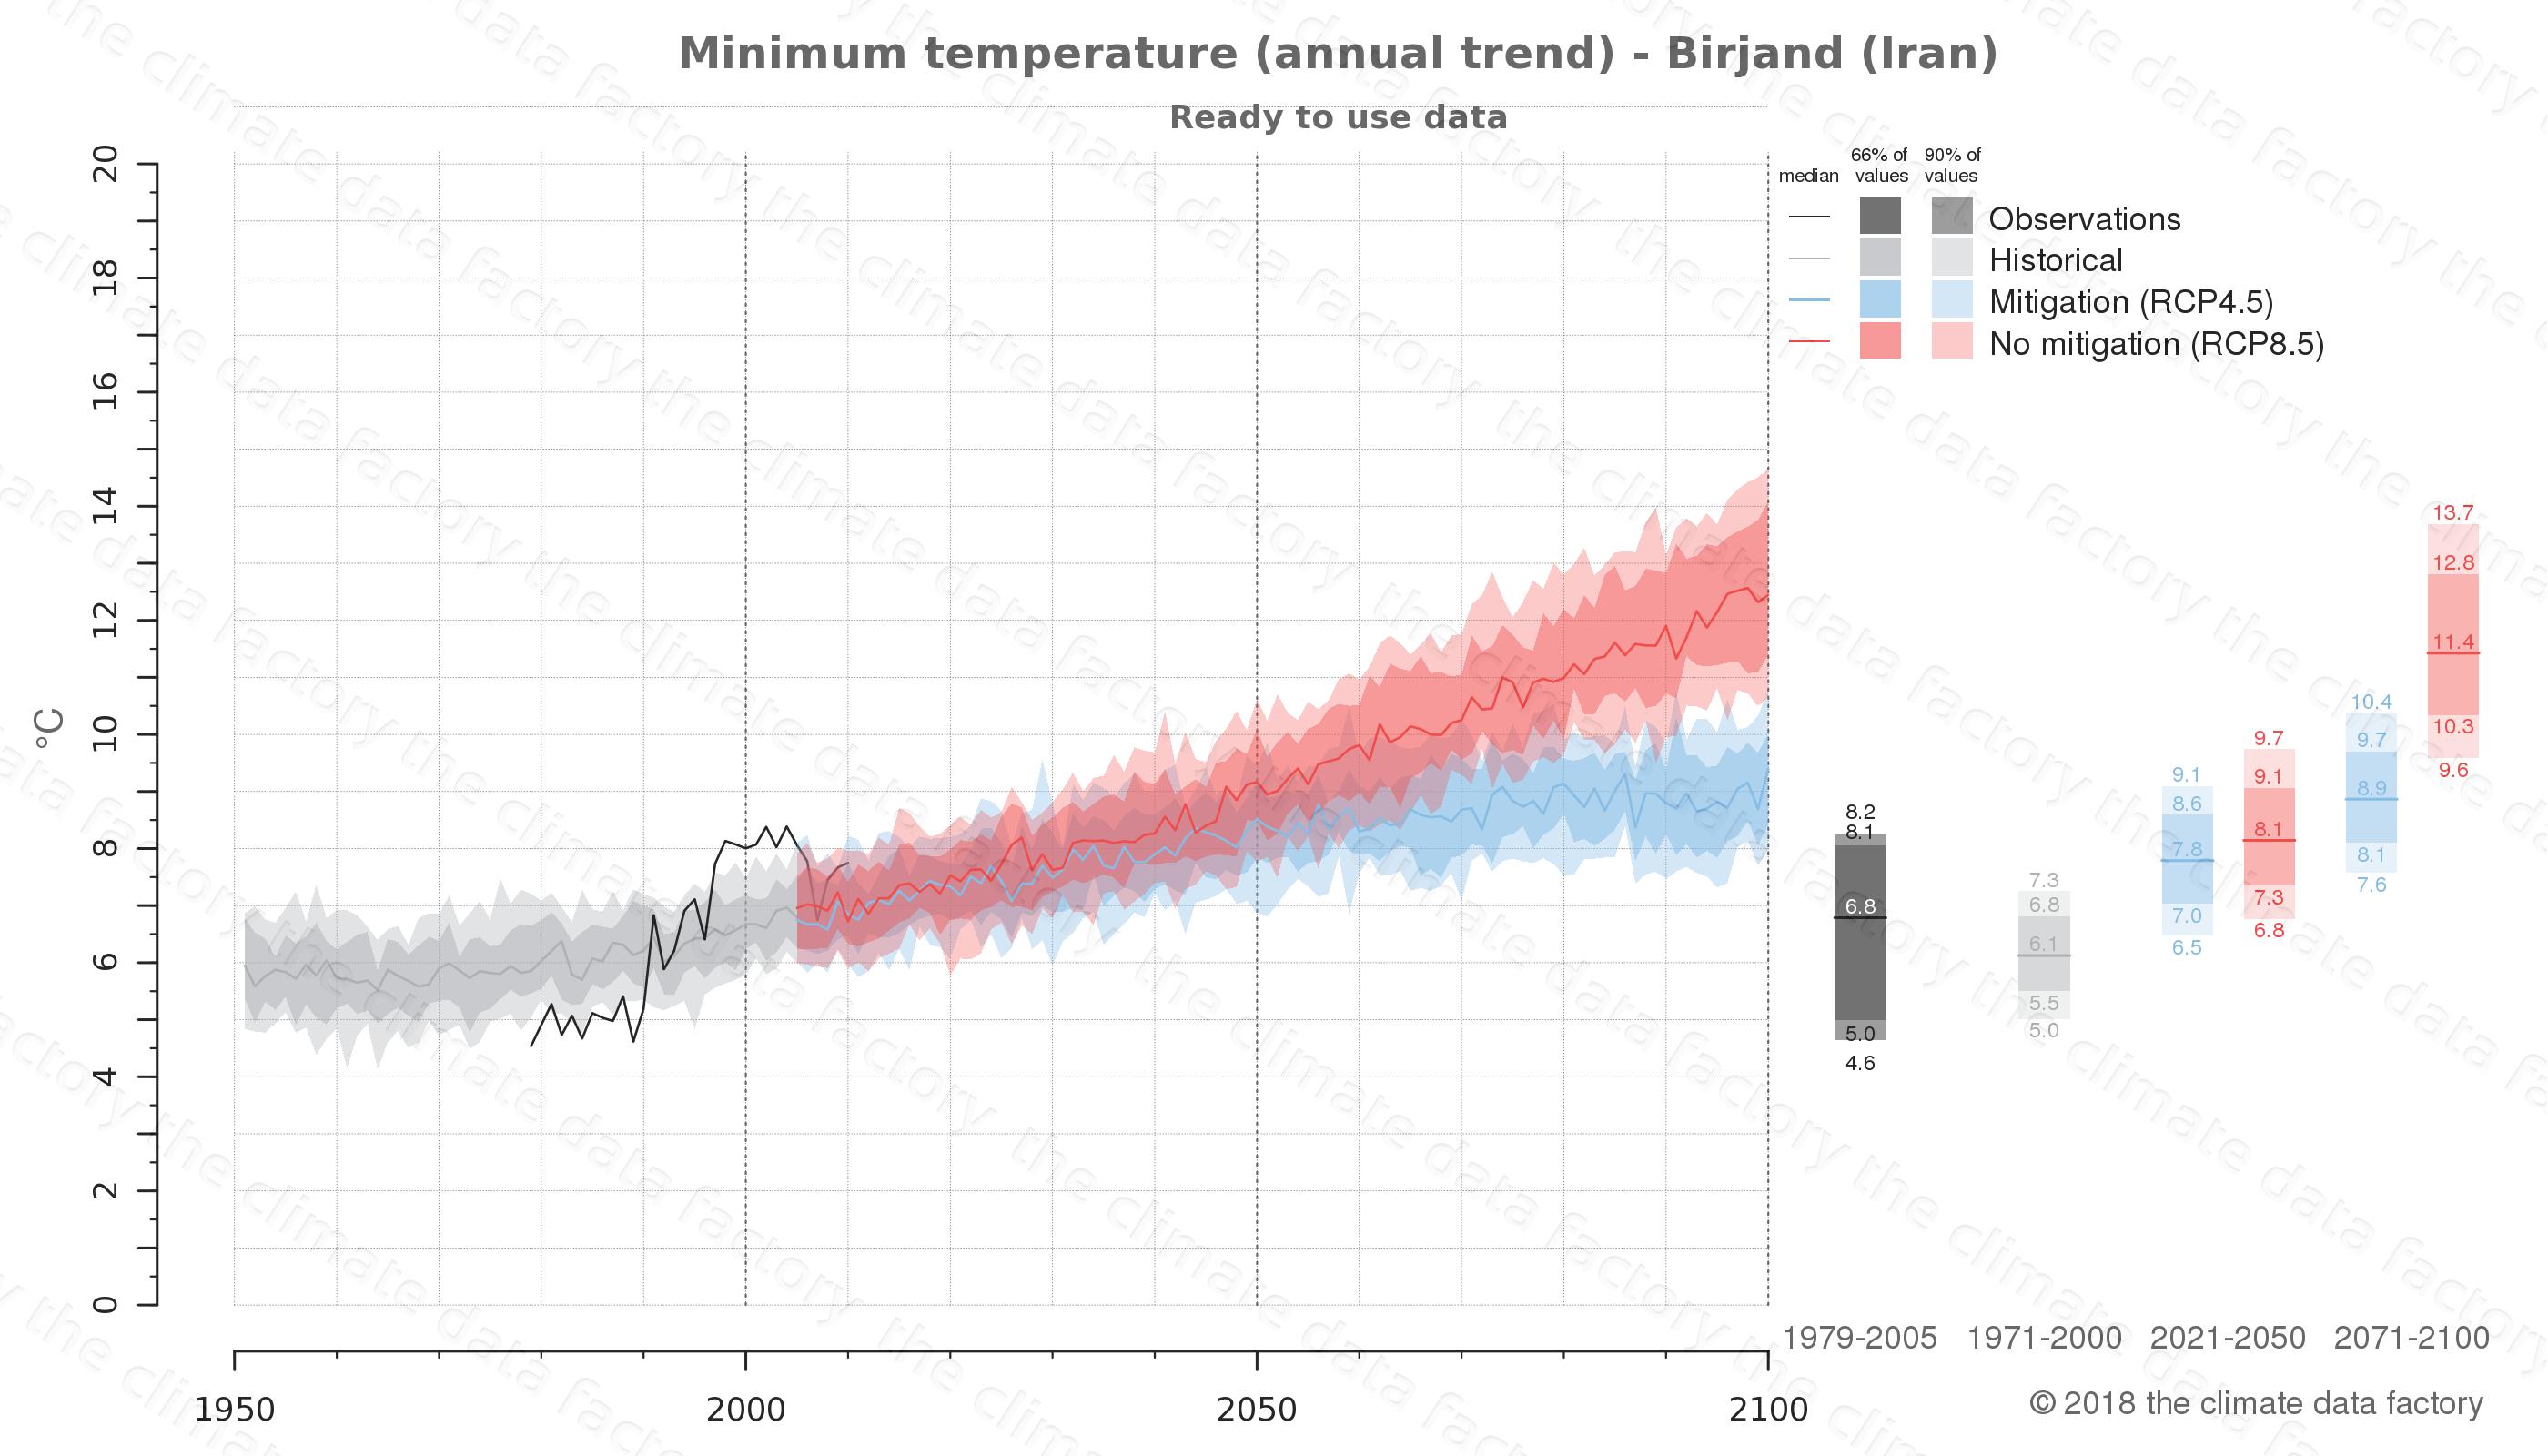 climate change data policy adaptation climate graph city data minimum-temperature birjand iran